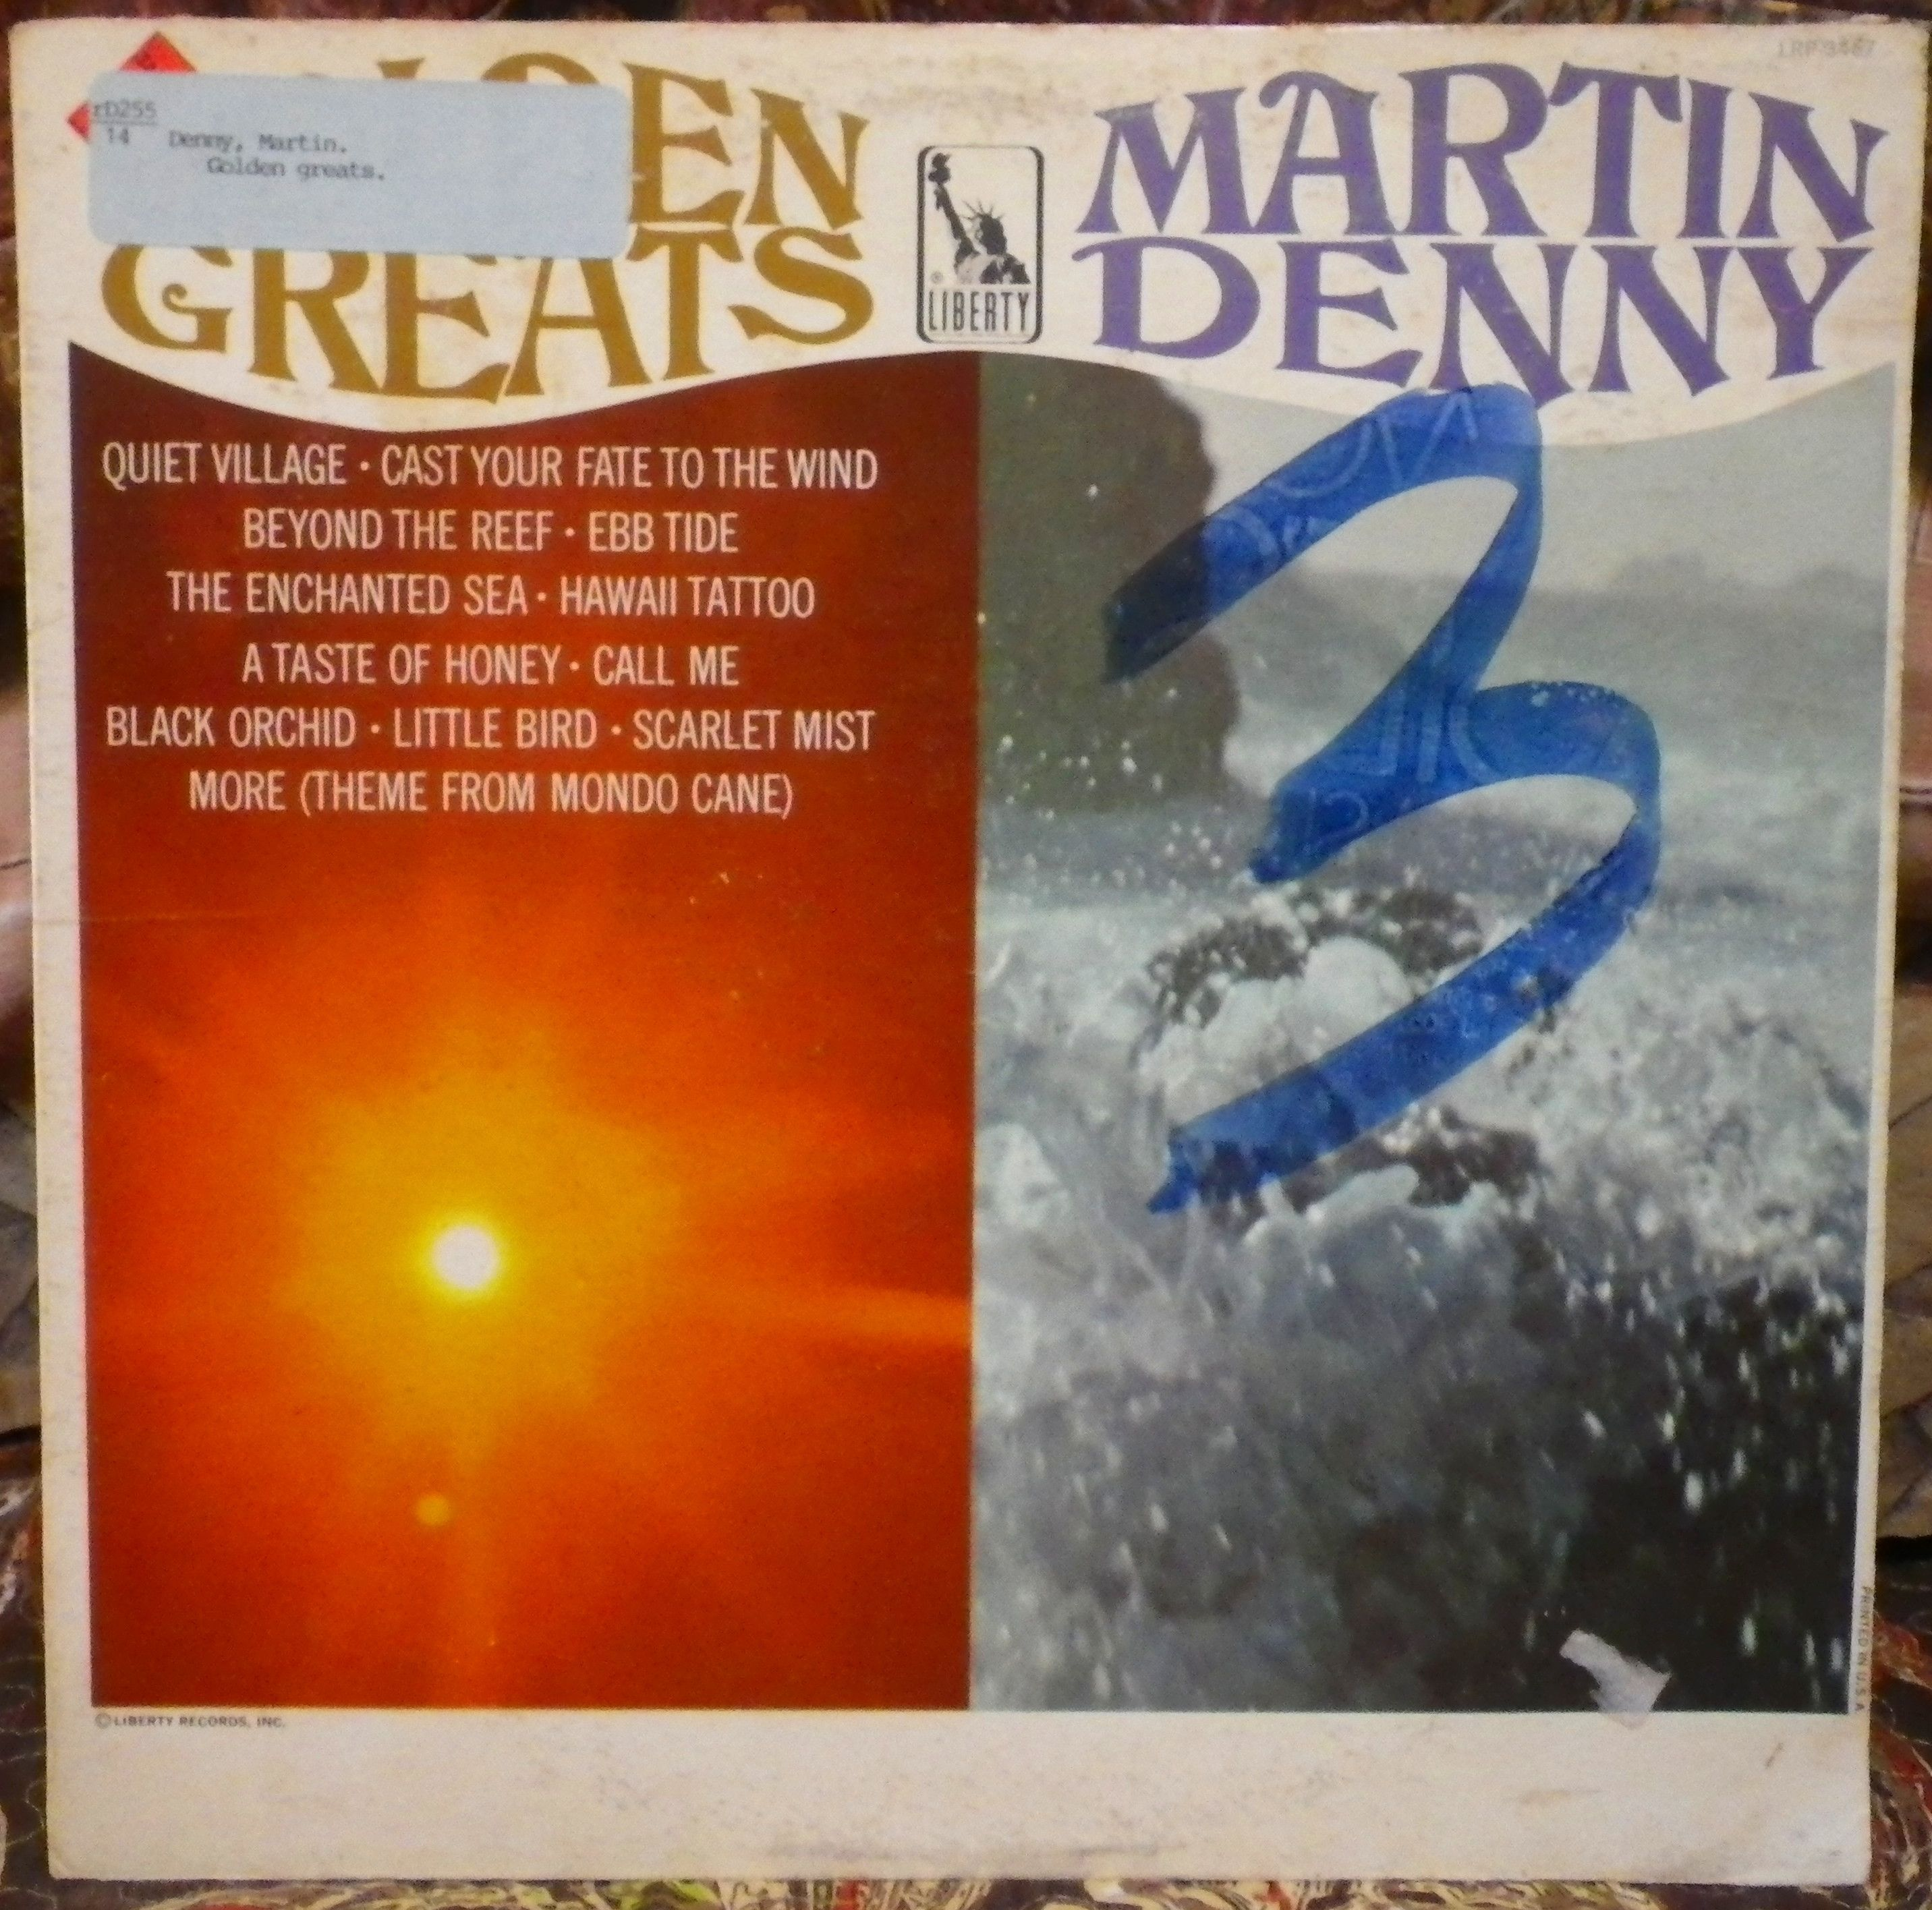 martin denny golden greats los angeles calif liberty records lrp 3467 mono no date exotica record my hawaiian exotica record collection  [ 2864 x 2832 Pixel ]